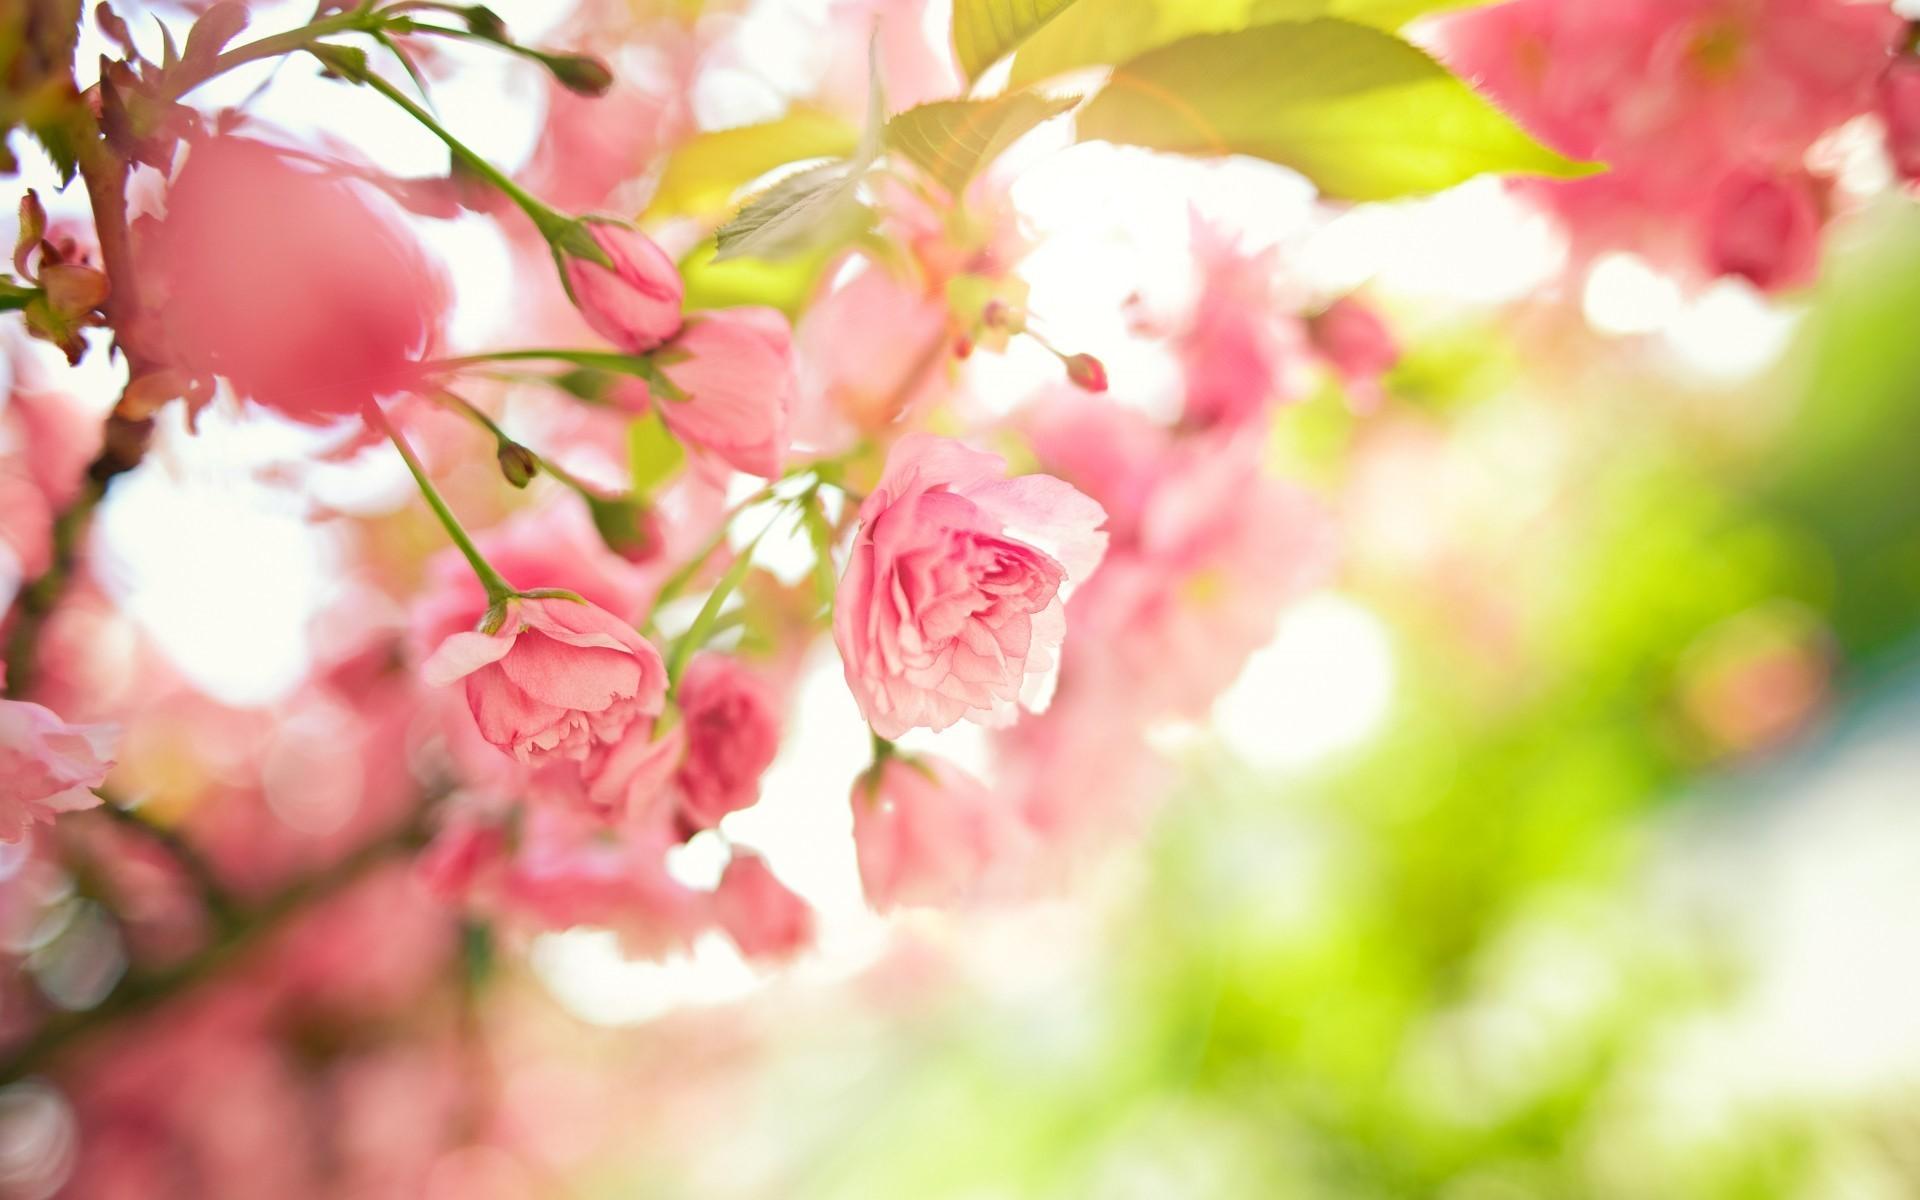 Desktop Wallpaper Spring Flowers 60 images 1920x1200